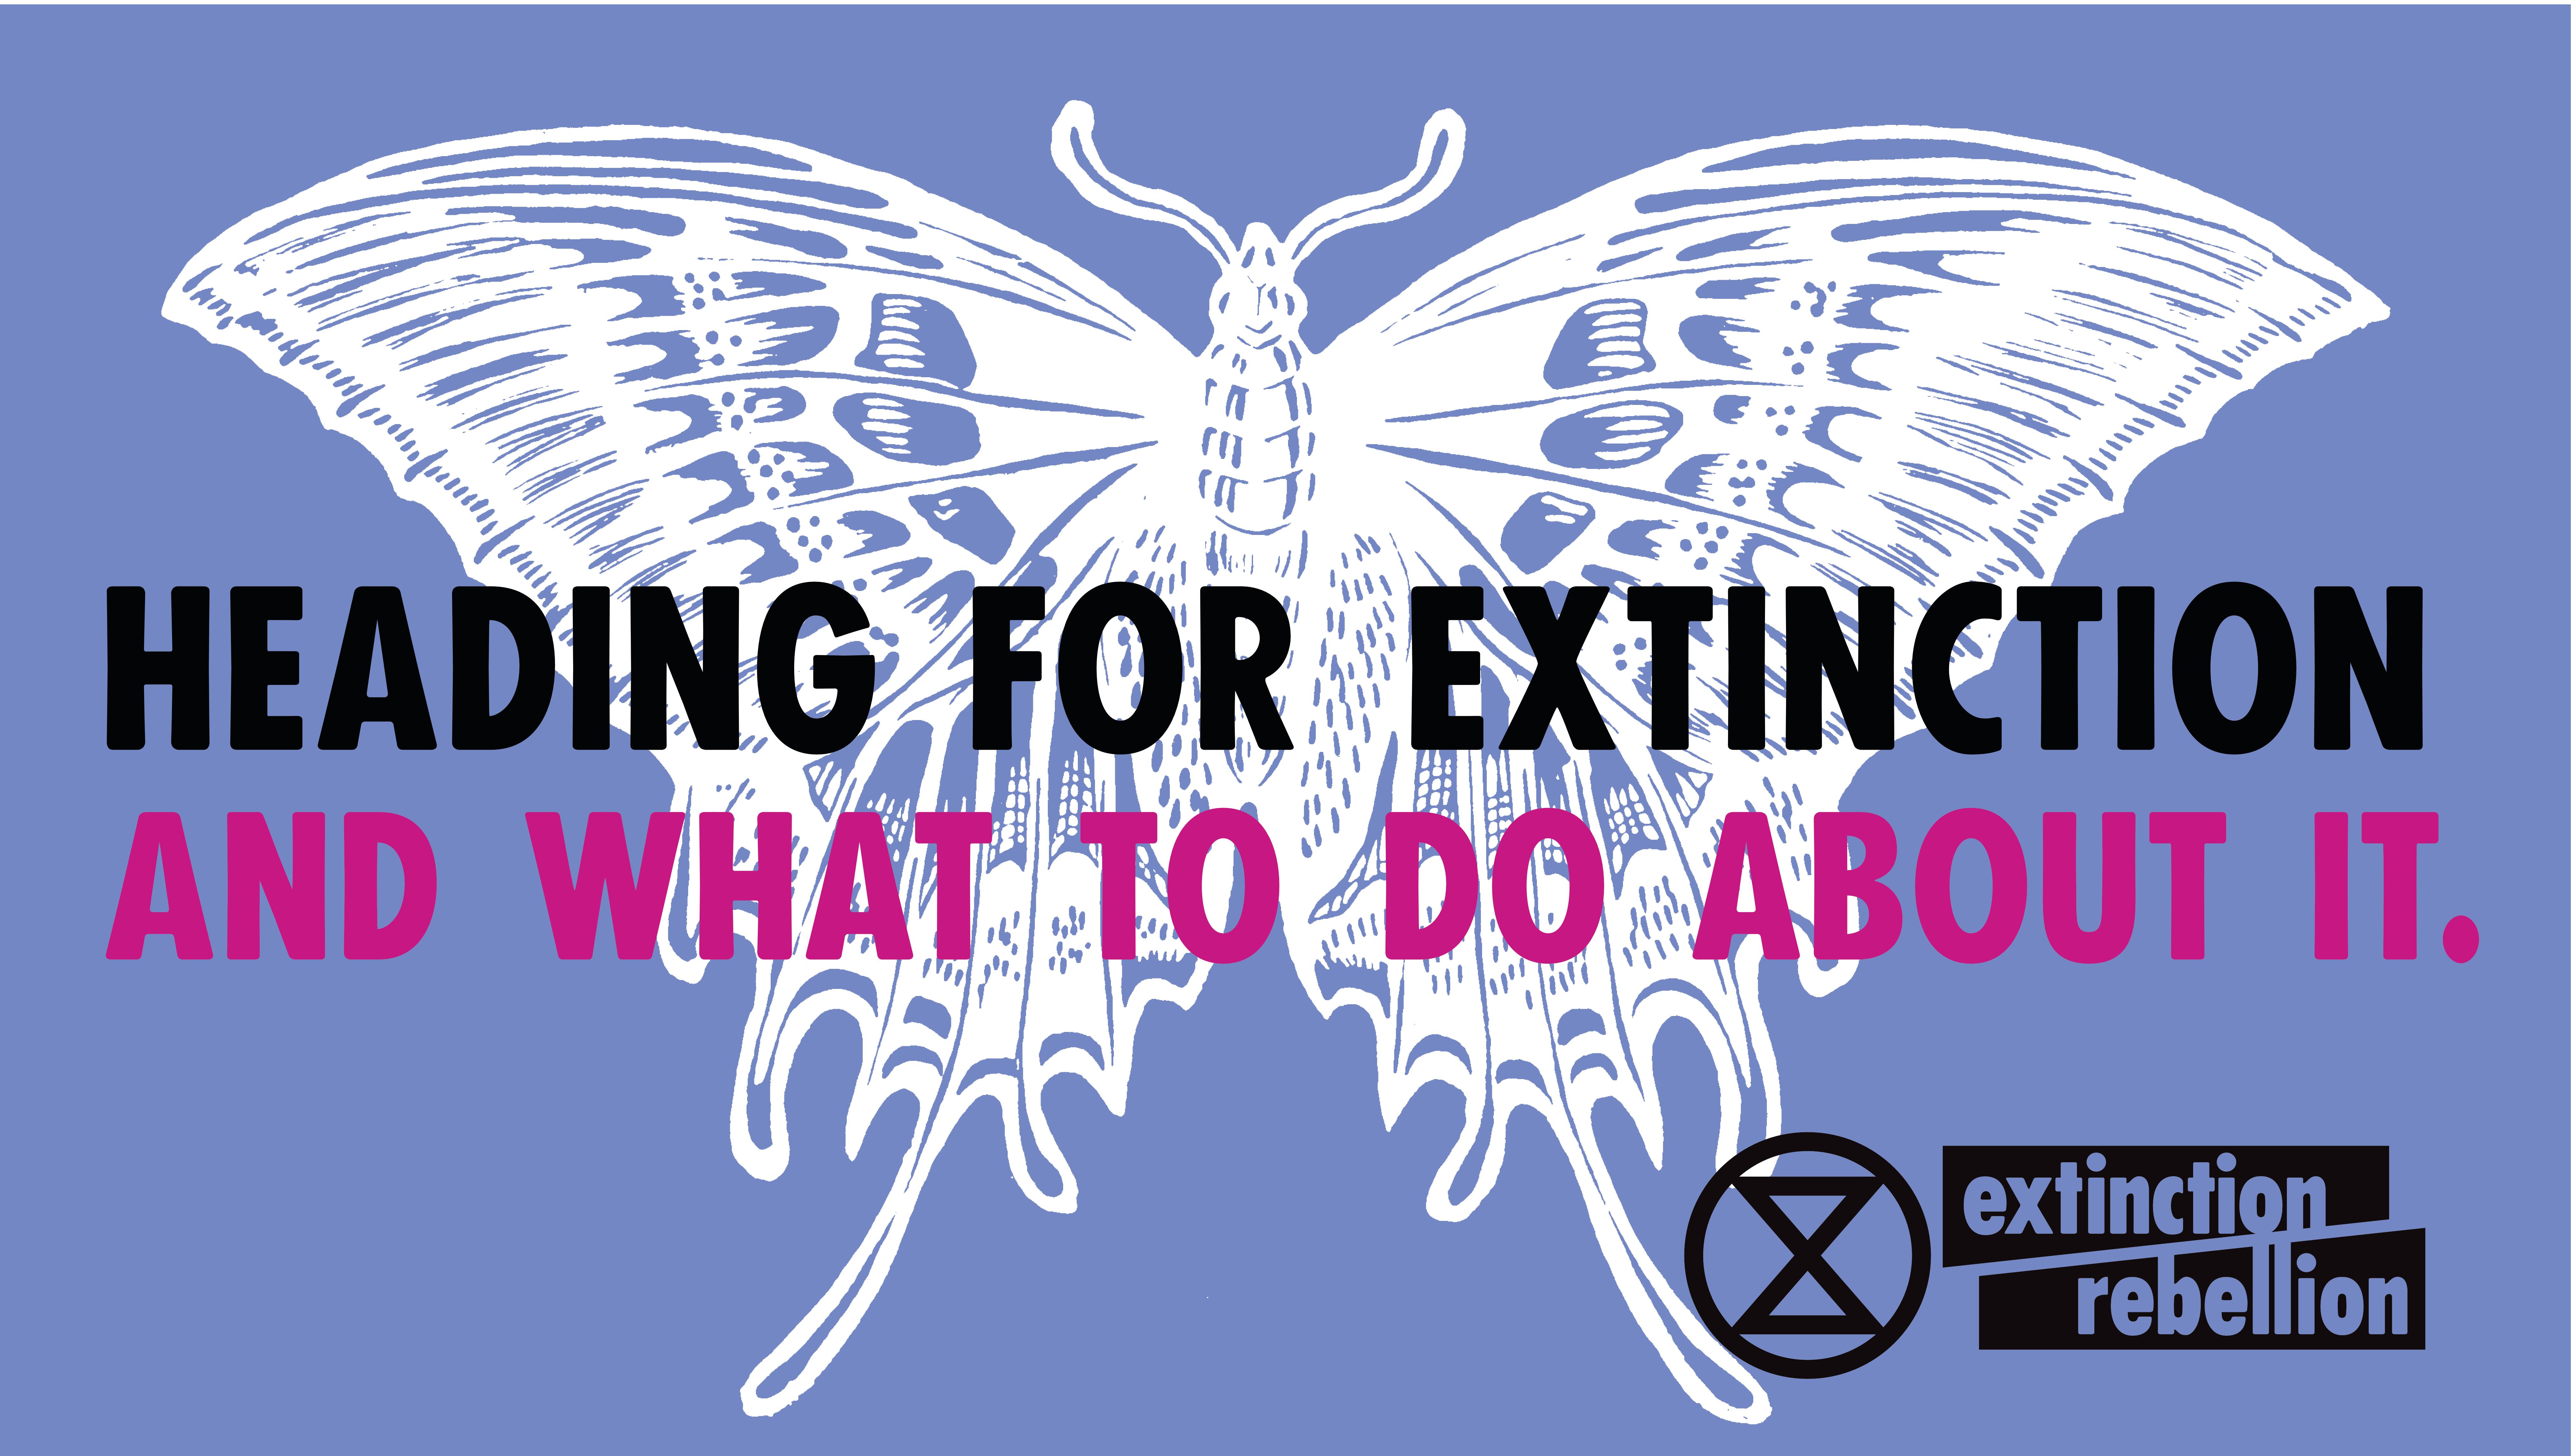 Xr-talk-heading-for-extinction-blue